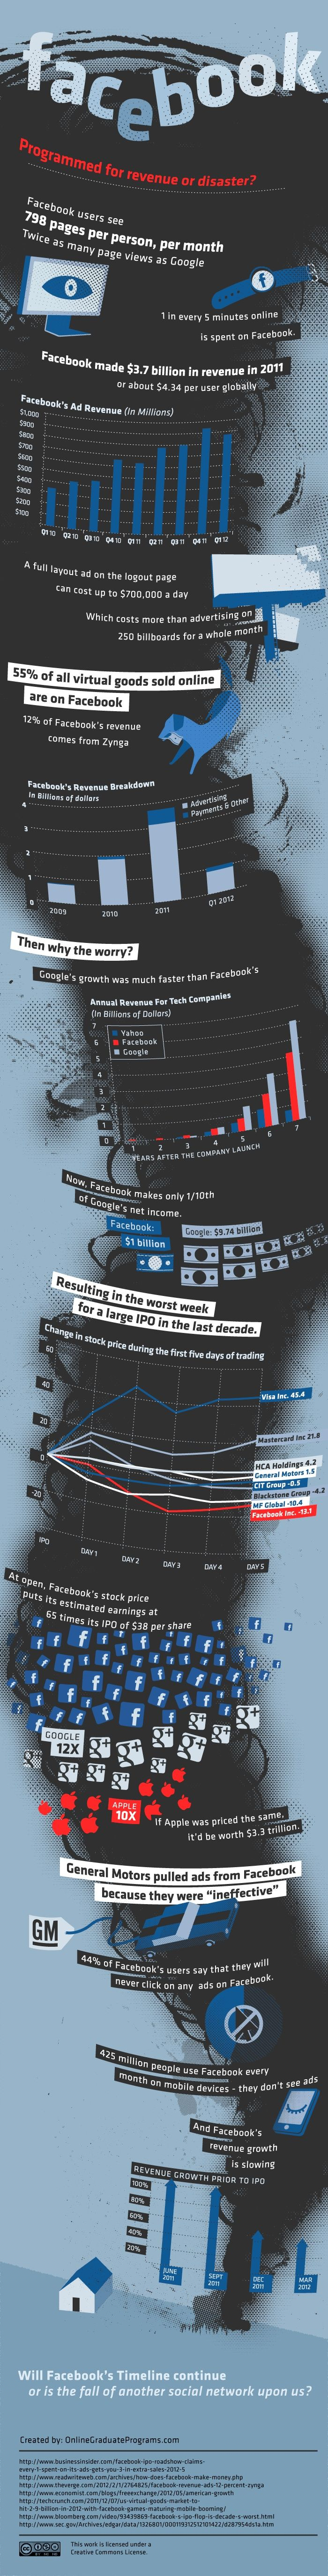 Facebook - Programmed for Revenue or Disaster? [Infographic]